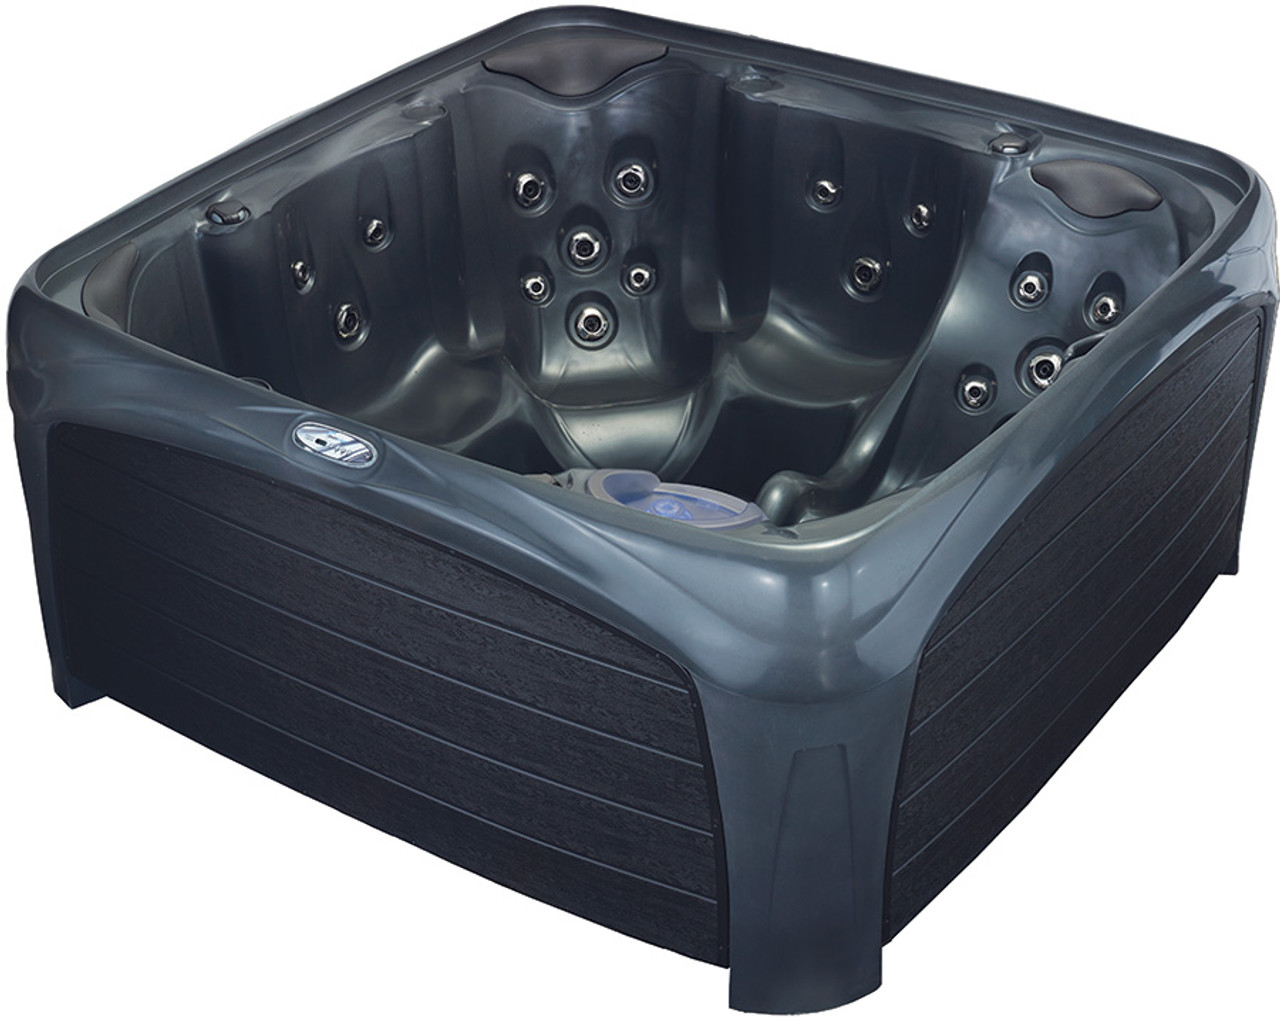 Crossover 730L Hot Tub - Metallic Gray & Black